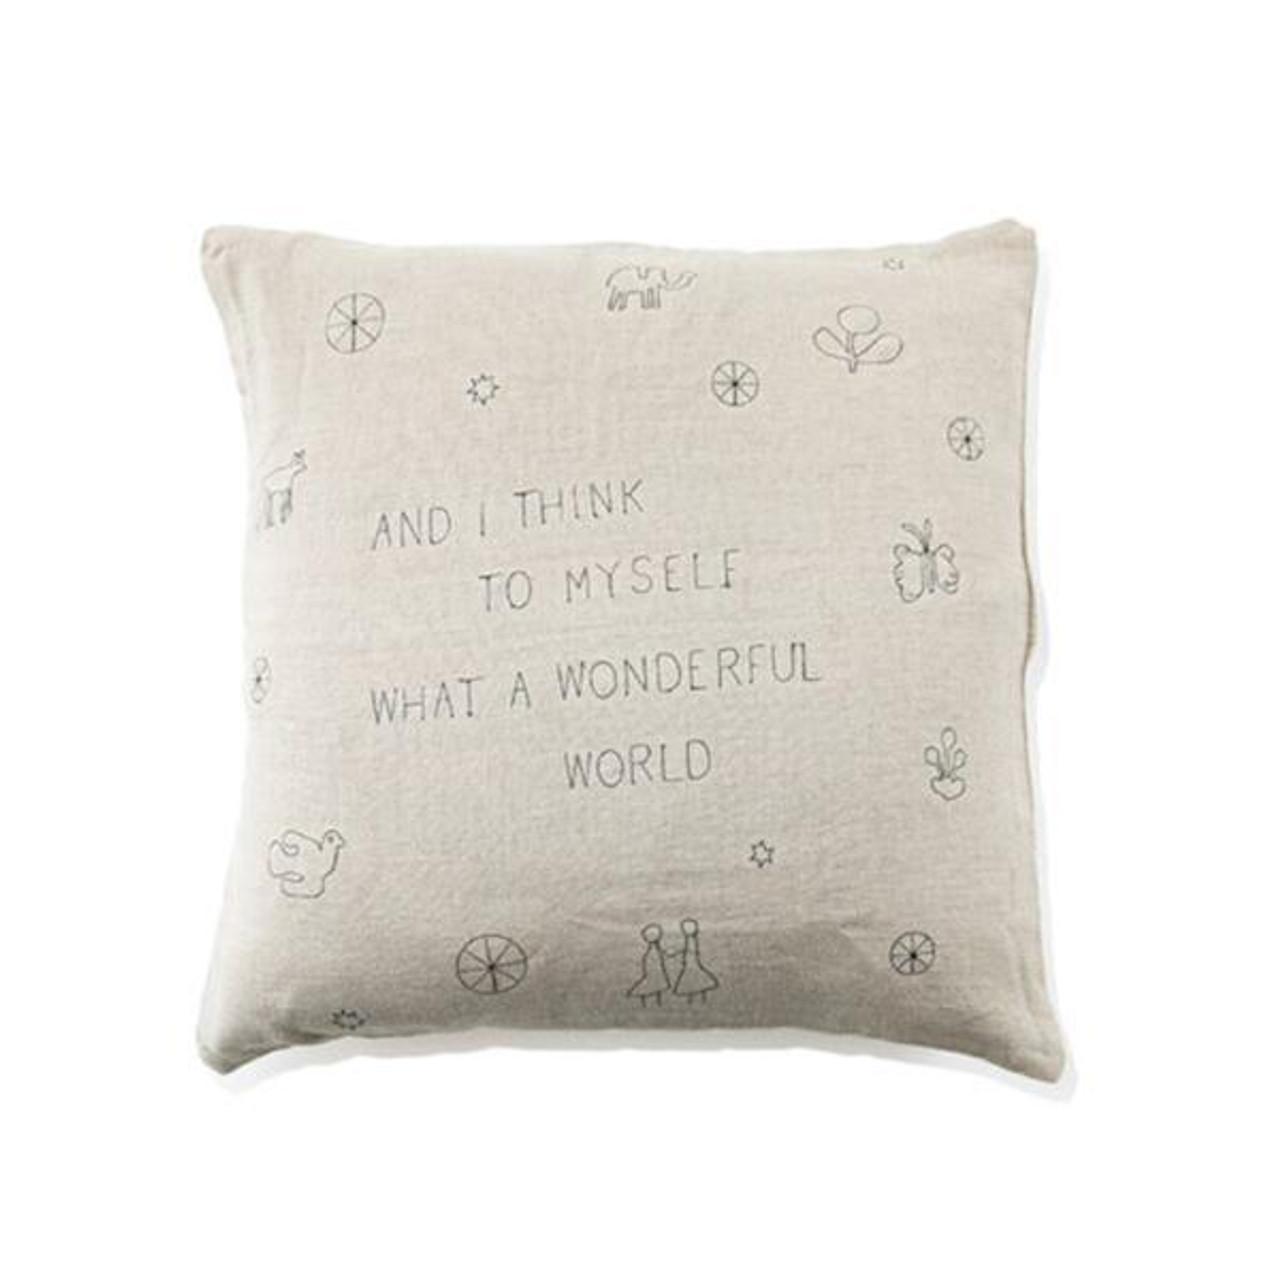 what a wonderful world pillow